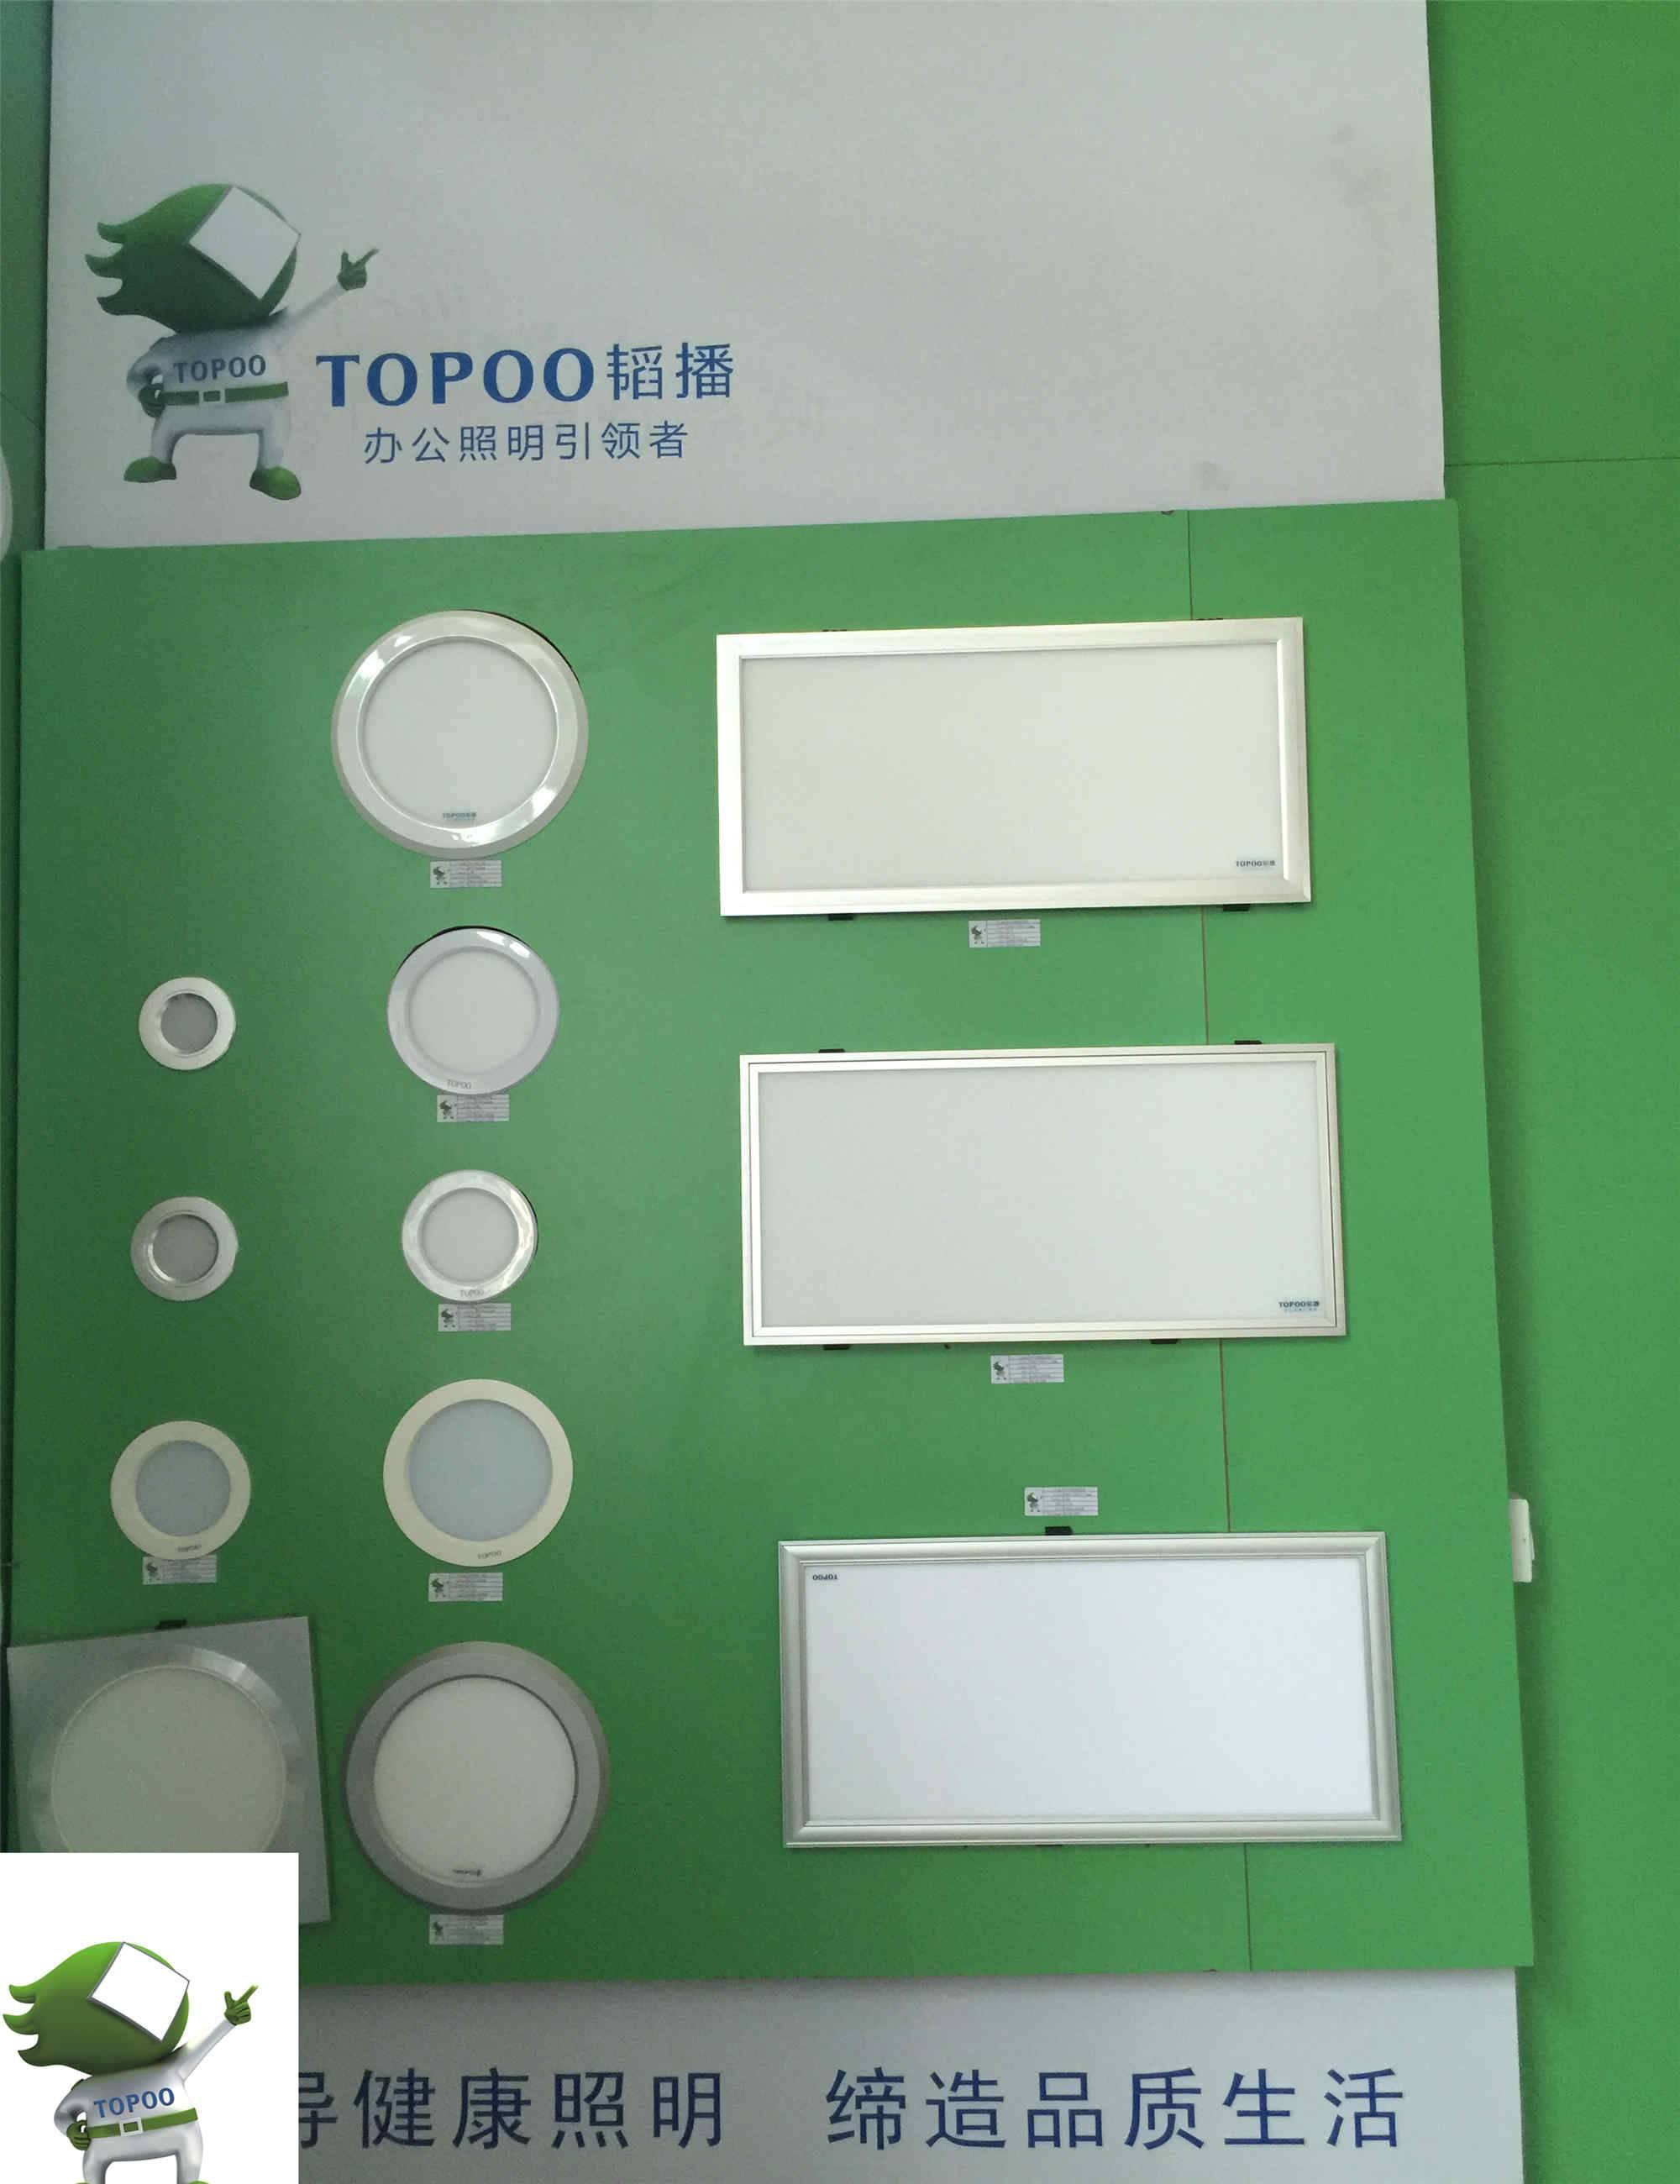 Hot sale 18w round led panel, 3W 6W 9W 12w 15w 18w led round panel light,18w Round Led Panel Light